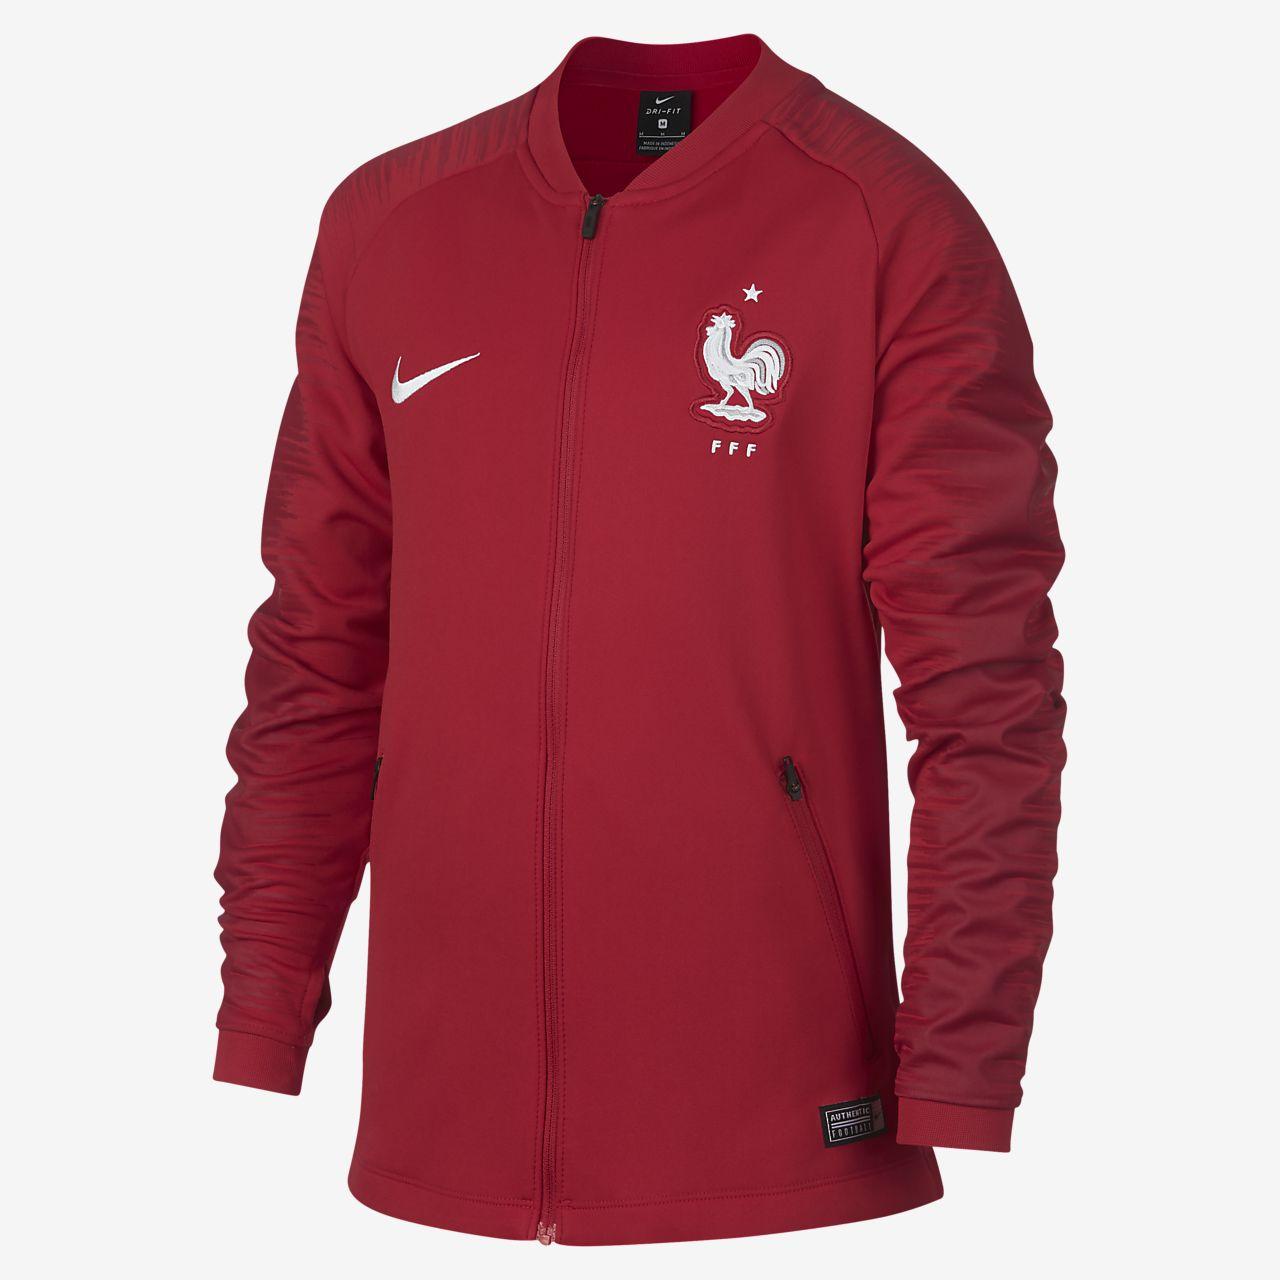 low priced size 7 classic FFF Anthem Older Kids' Football Jacket